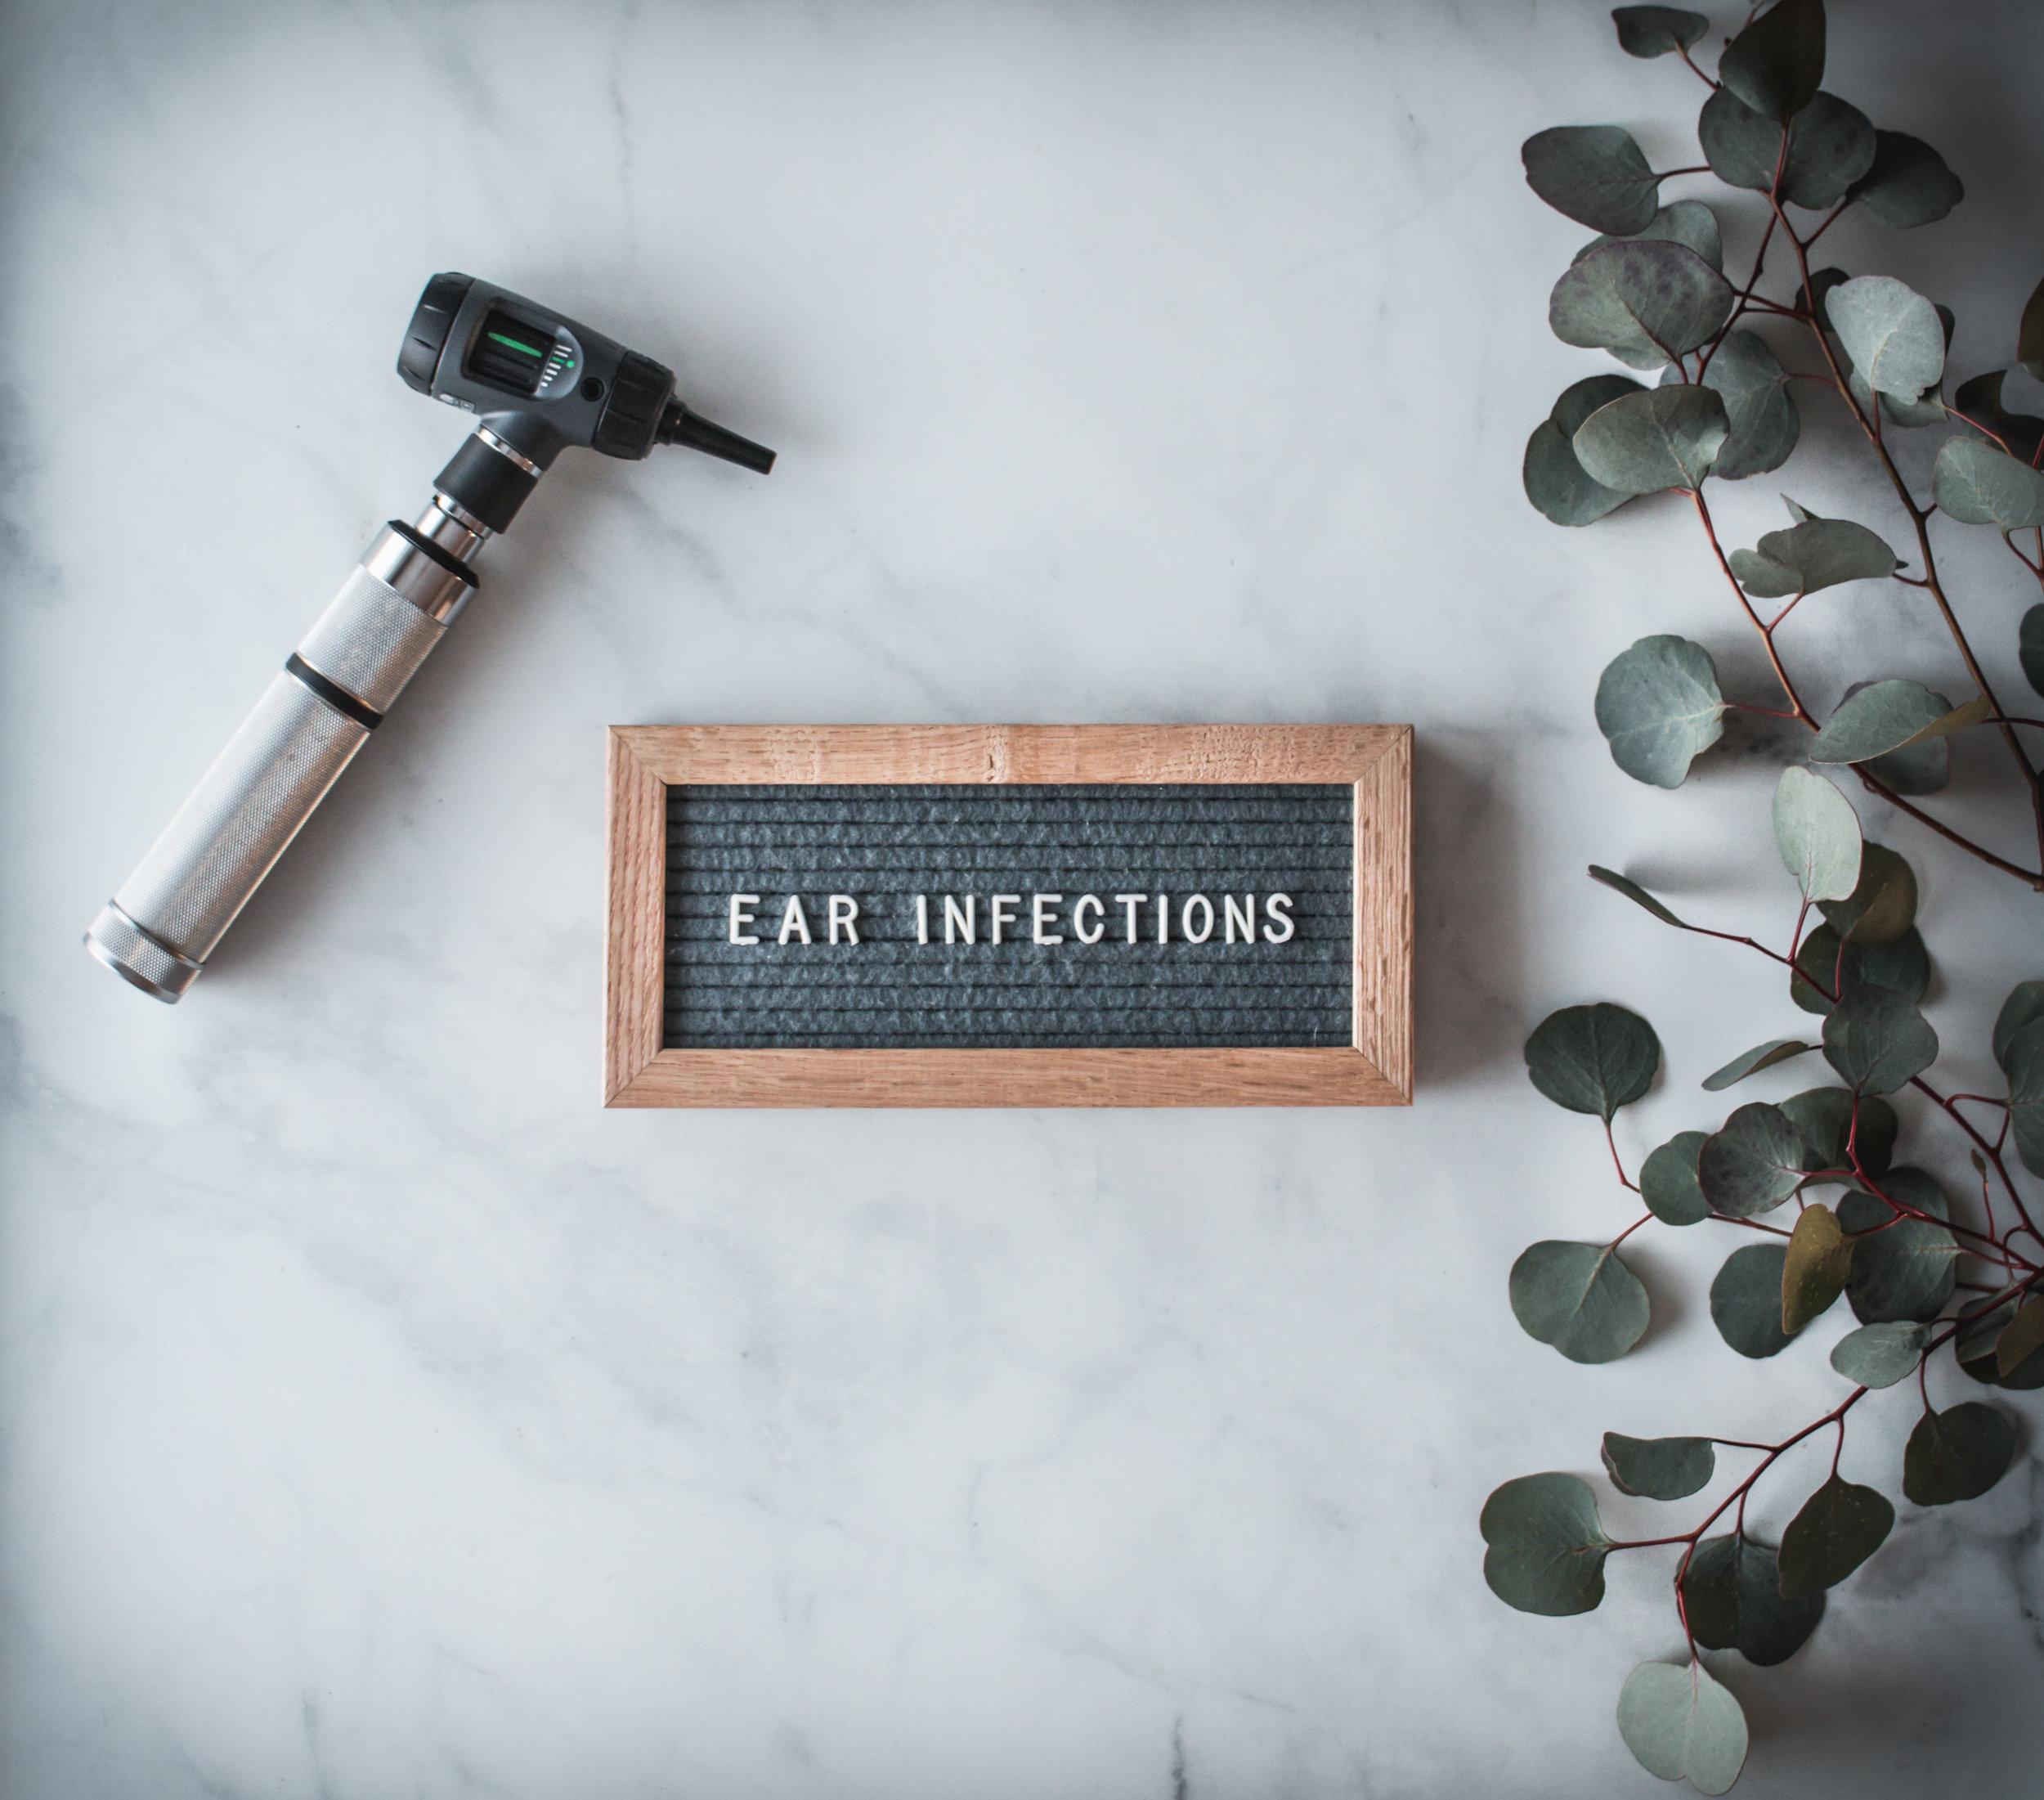 ear infections letterfolk (1 of 1).jpg